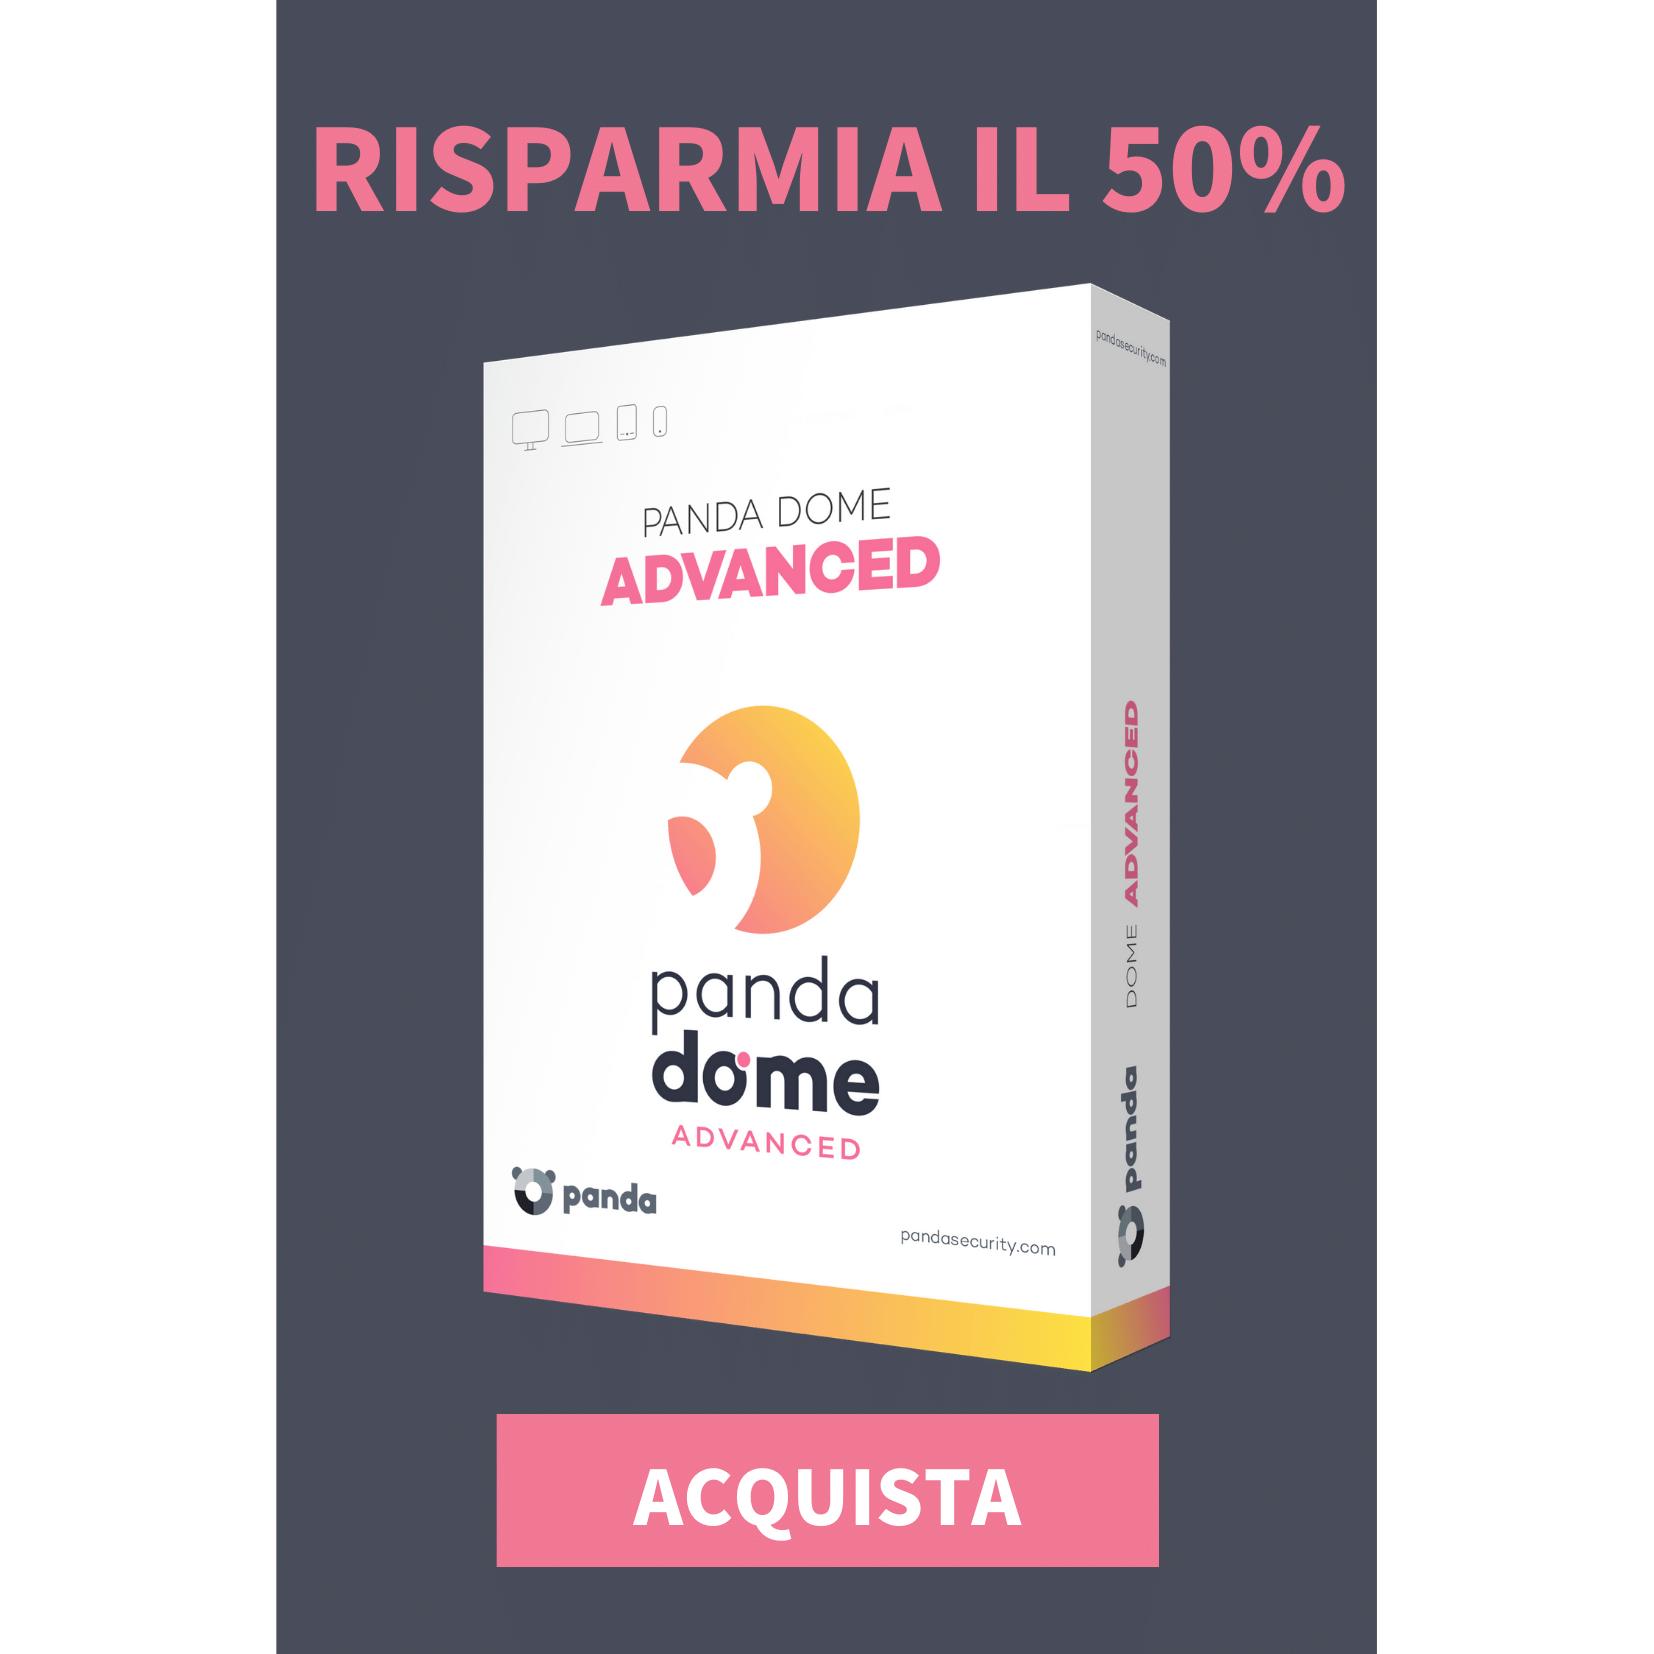 Download Panda Dome Advanced